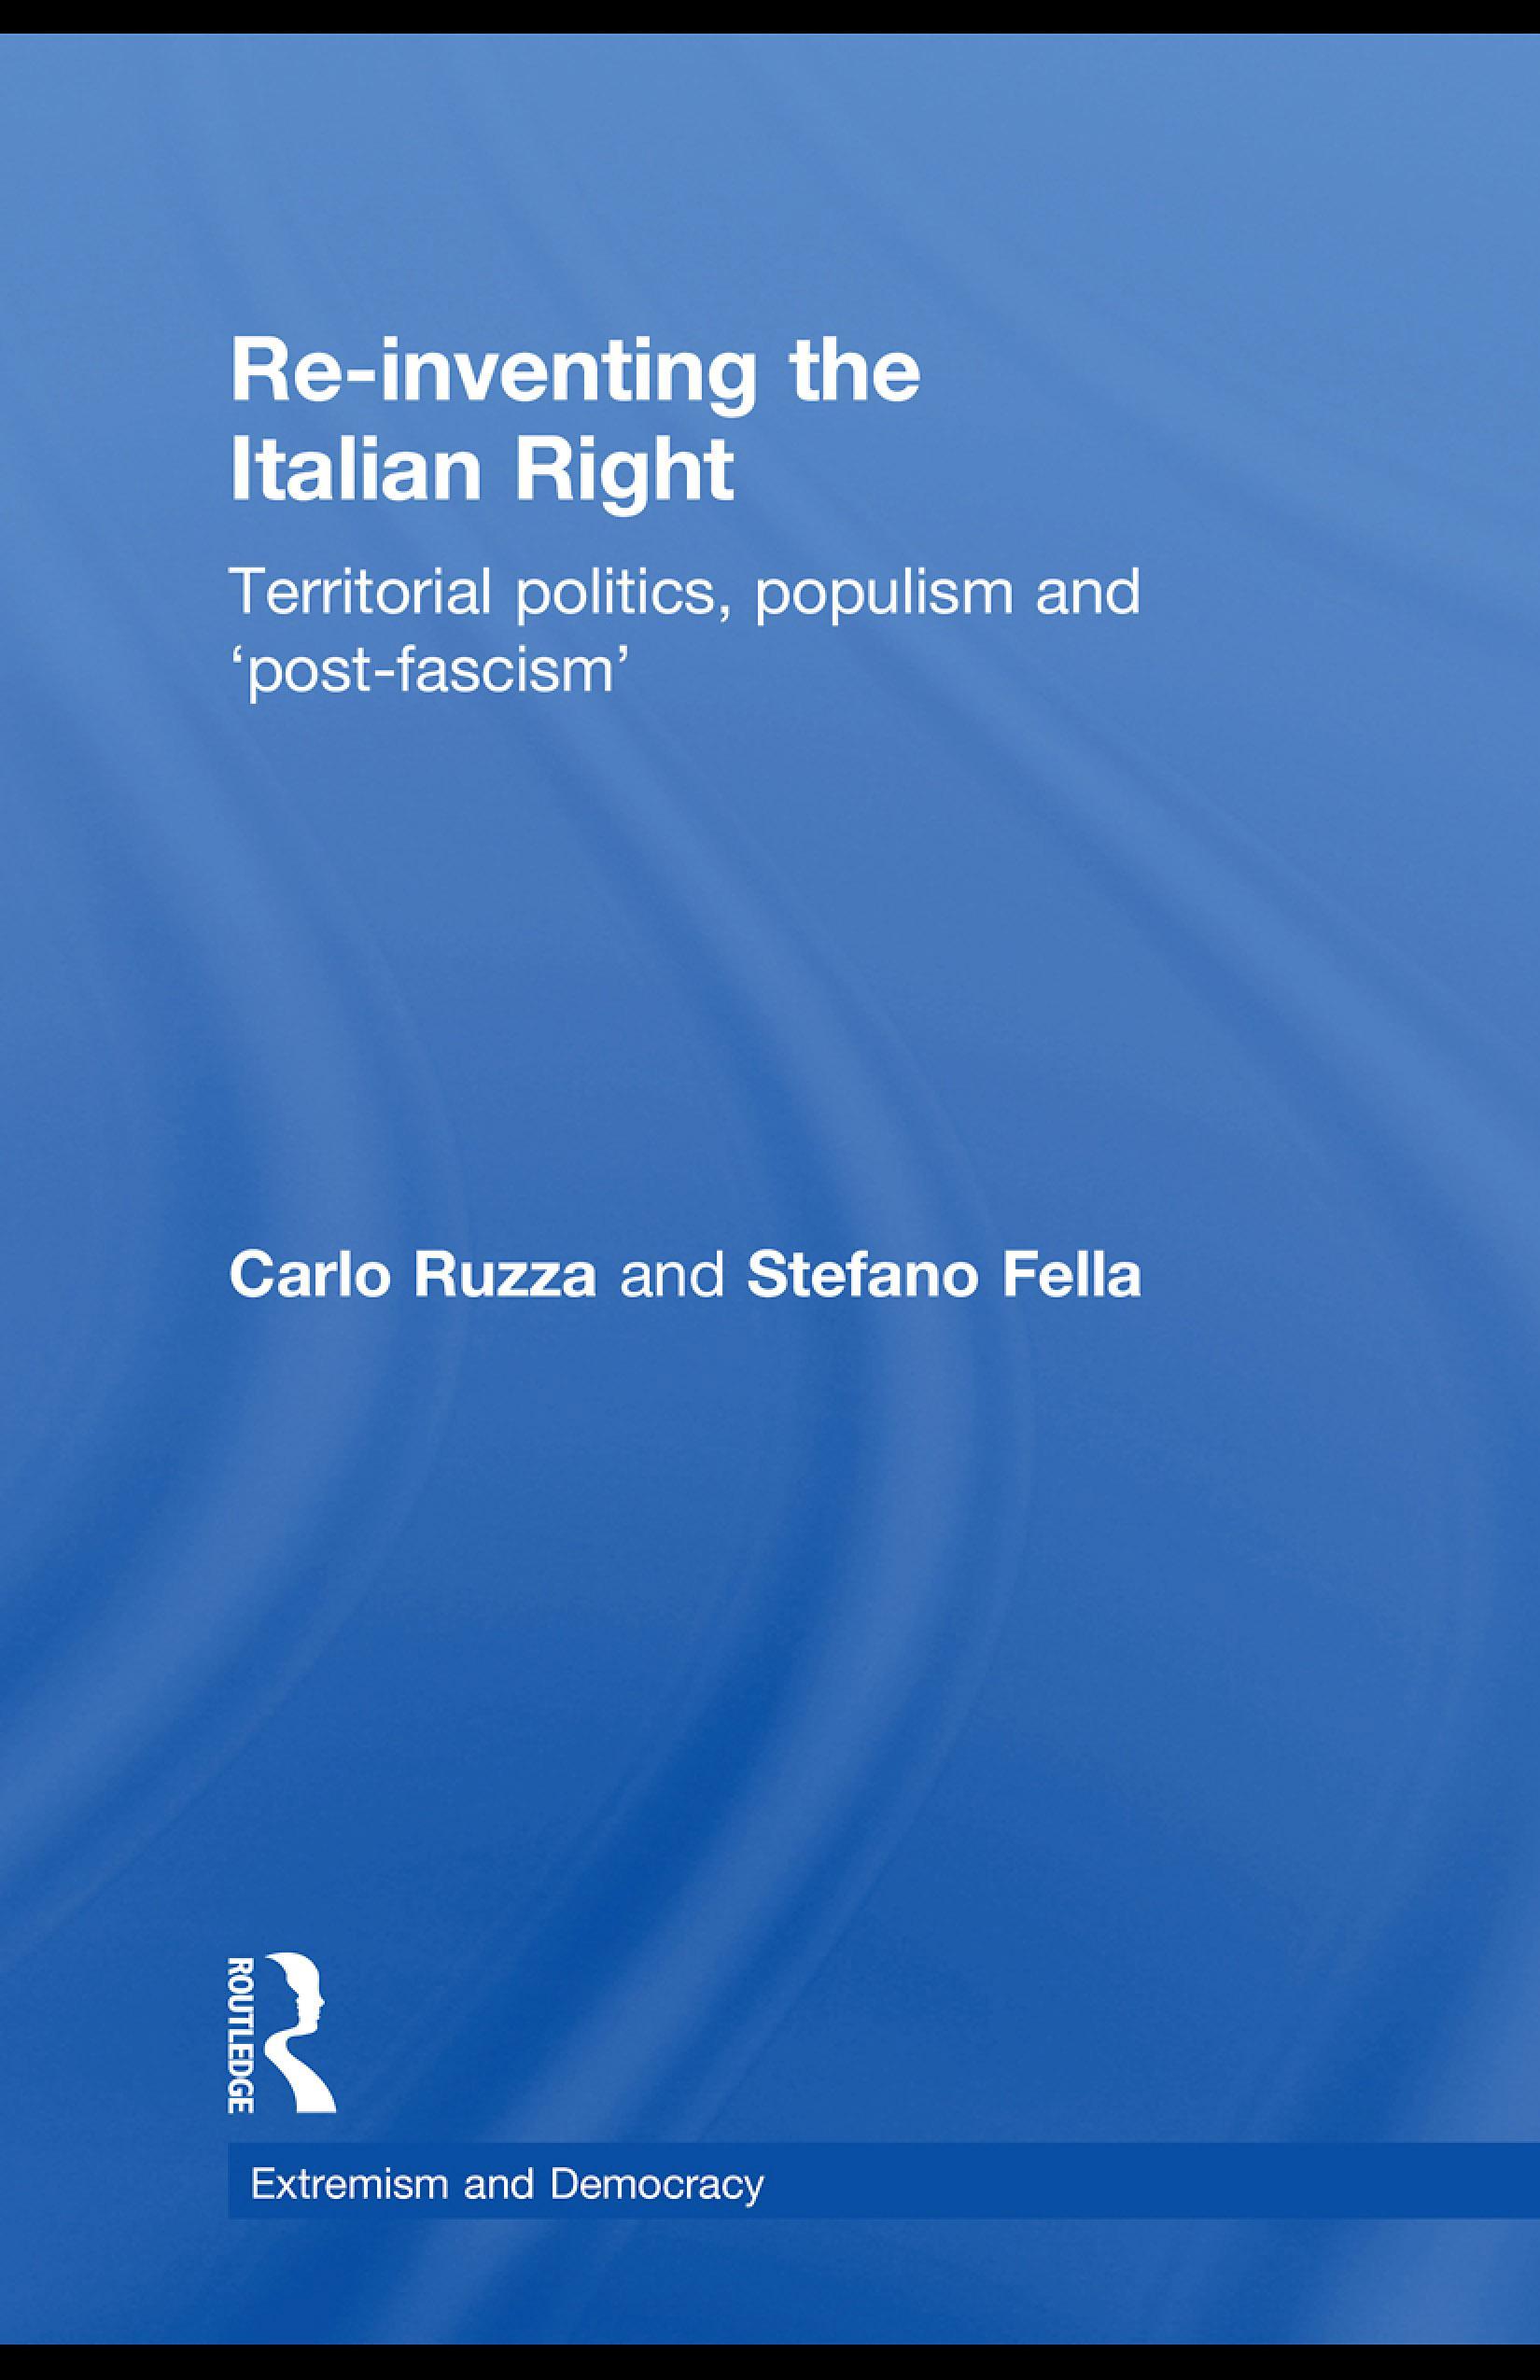 Re-inventing the Italian Right: Territorial politics, populism and 'post-fascism' EB9780203875742